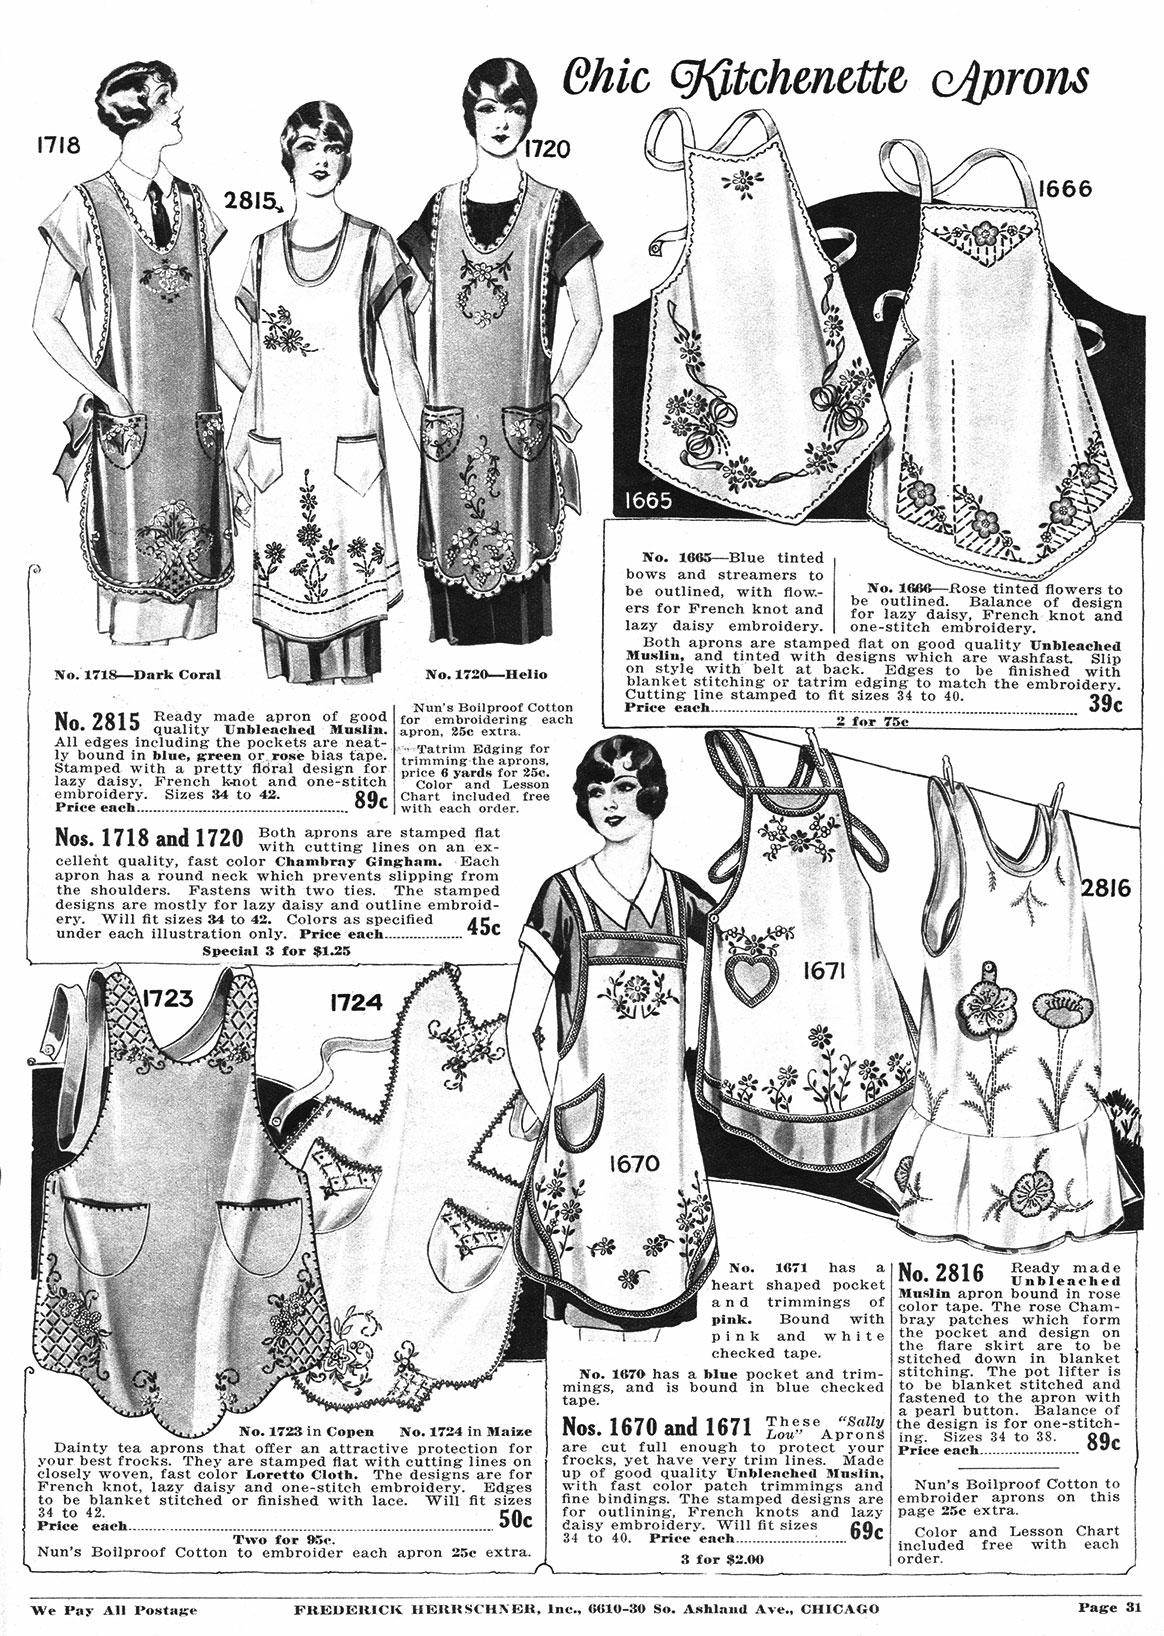 Herrschner-Kitchenette-Aprons-1928